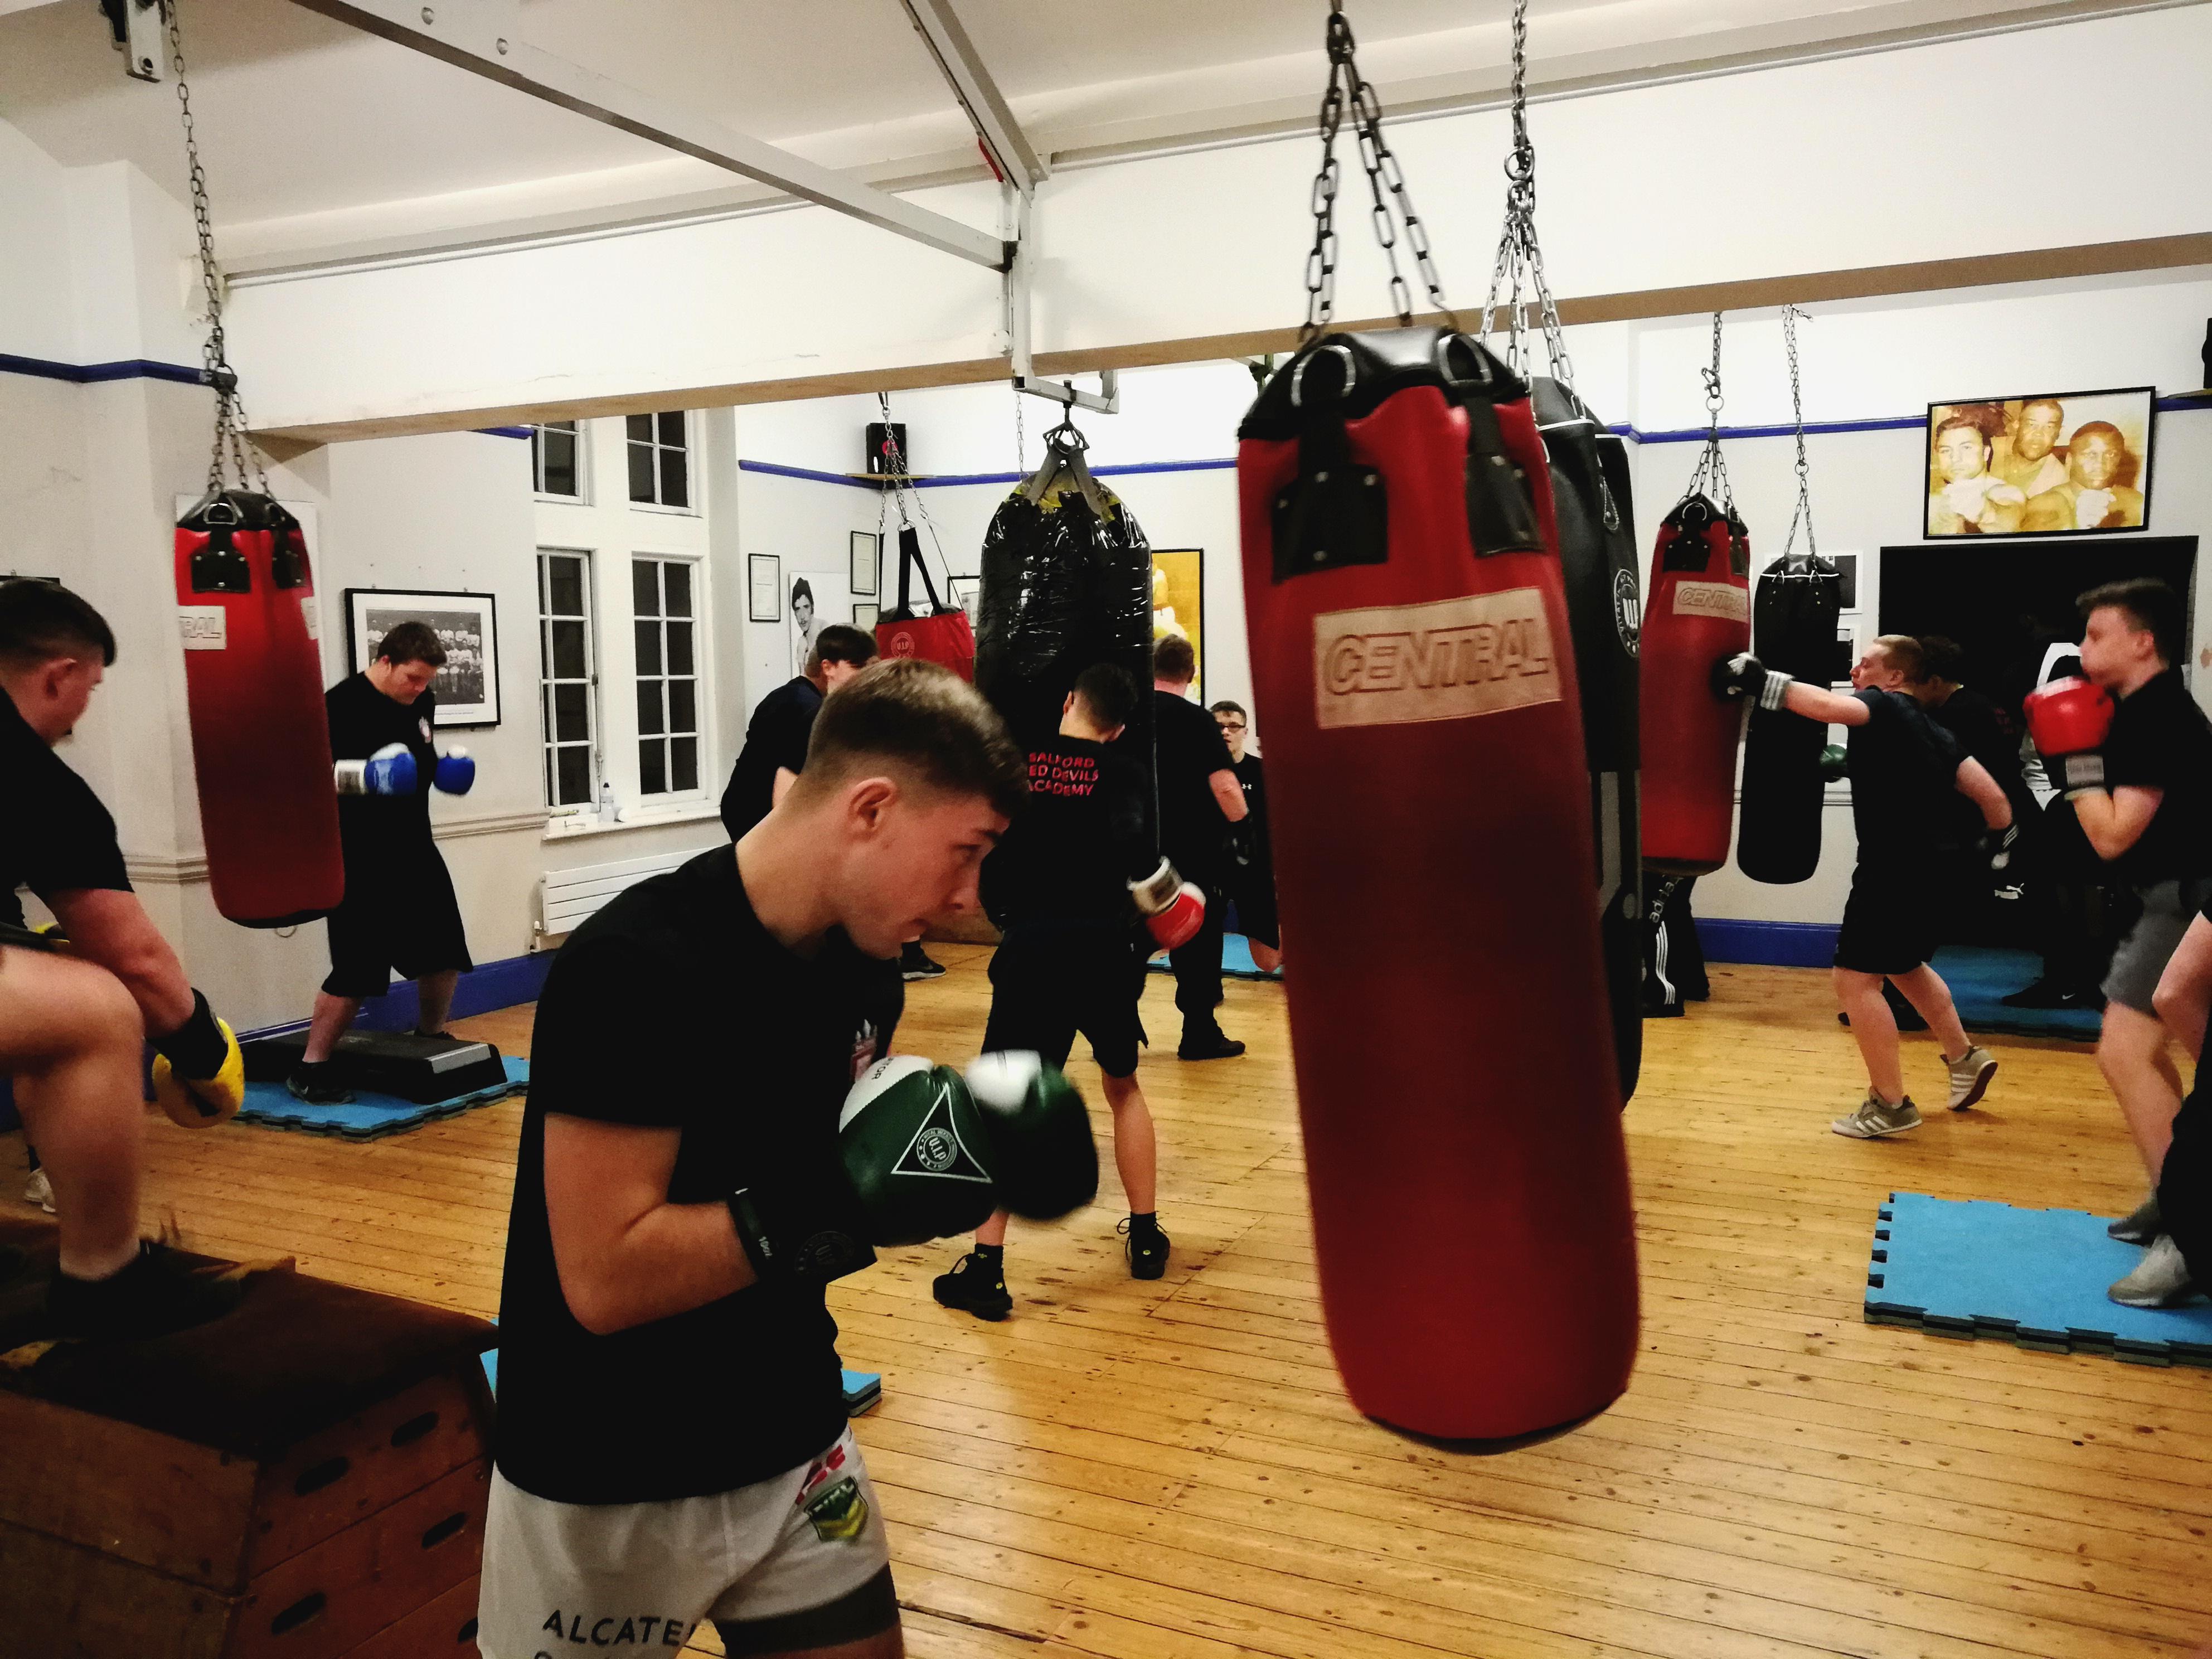 Ancoats amateur boxing club